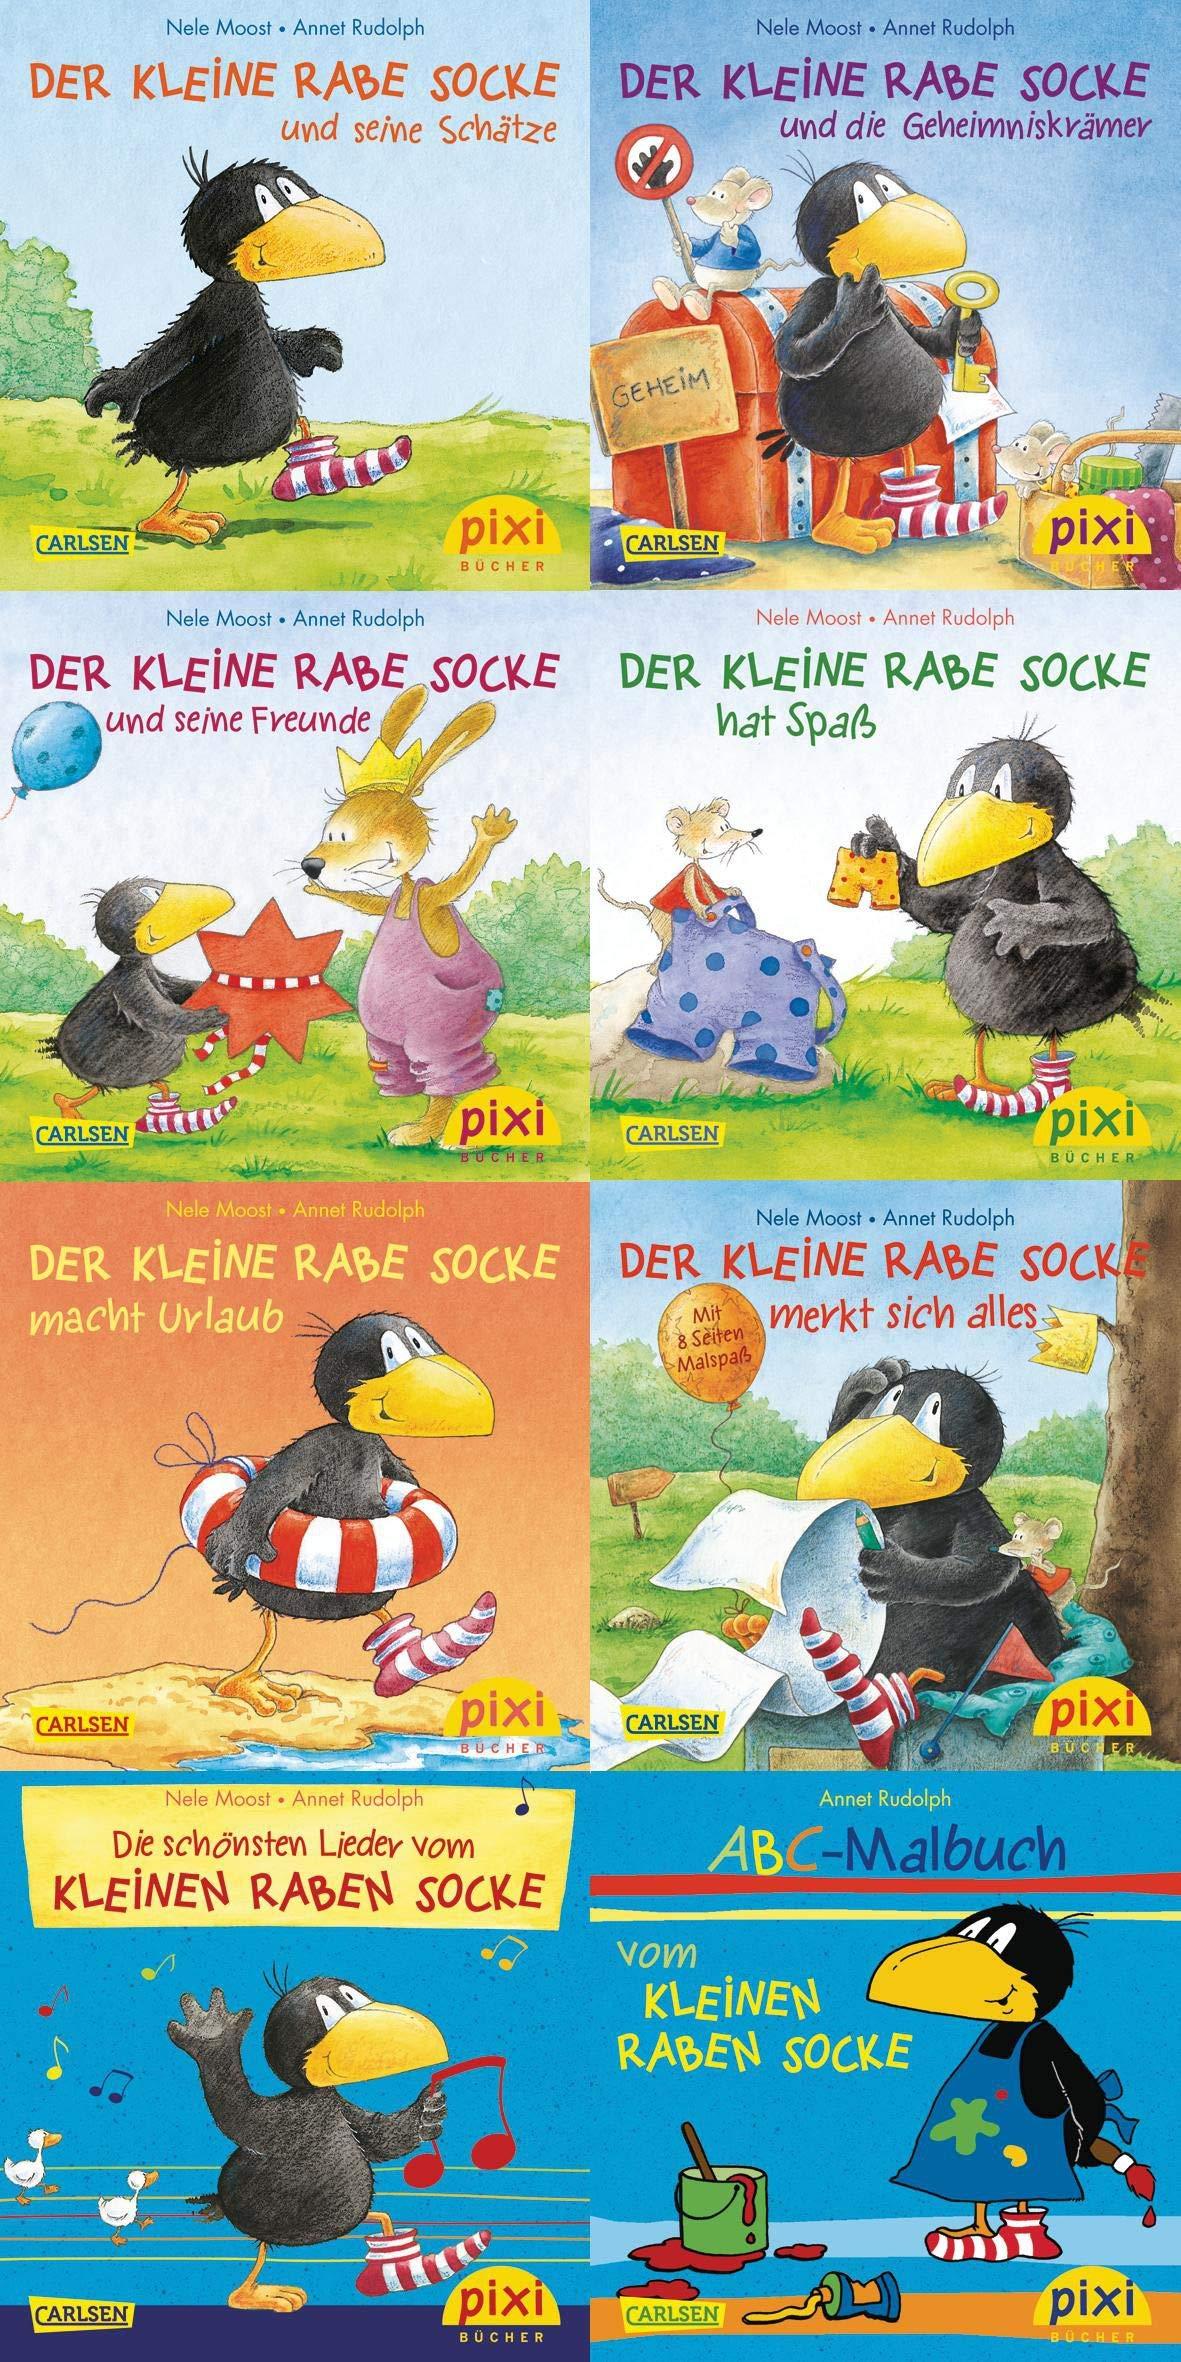 Pixi-Bundle 8er Serie 193: Der kleine Rabe Socke (Pixi-8er-Set, Band 193)